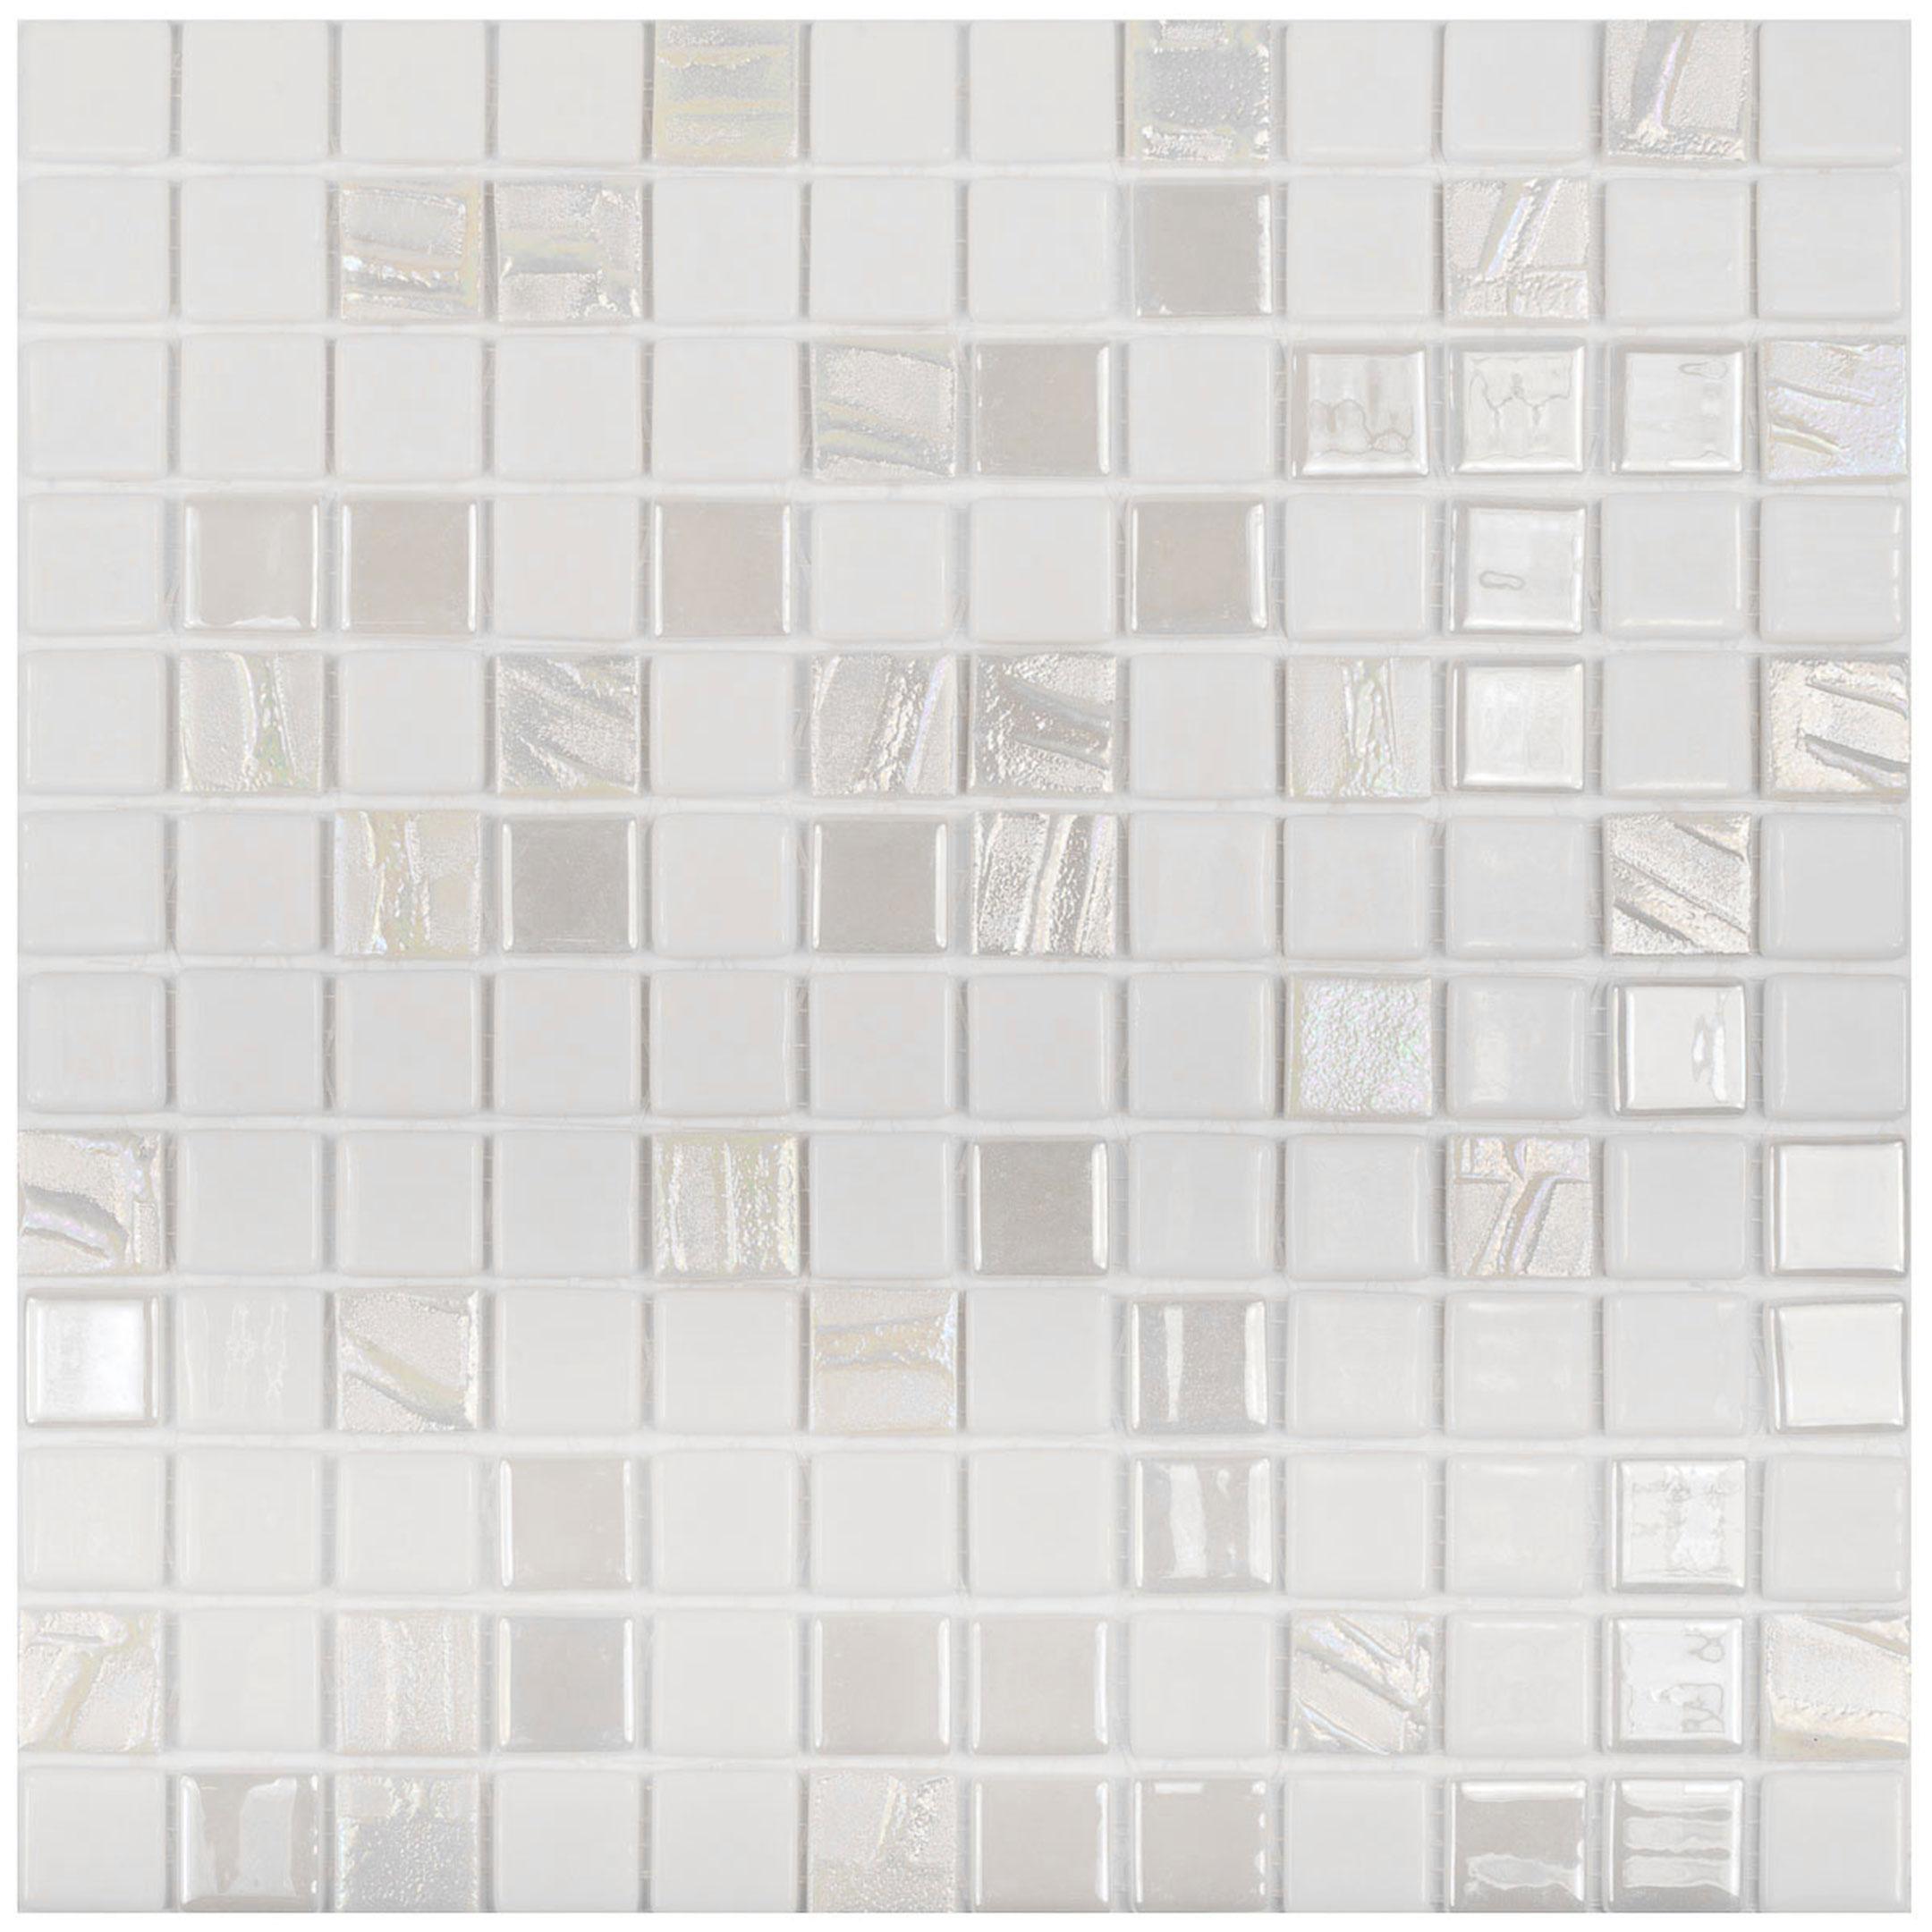 цена на Мозаика Vidrepur Astro Blanco белая стеклянная 317х317х4 мм